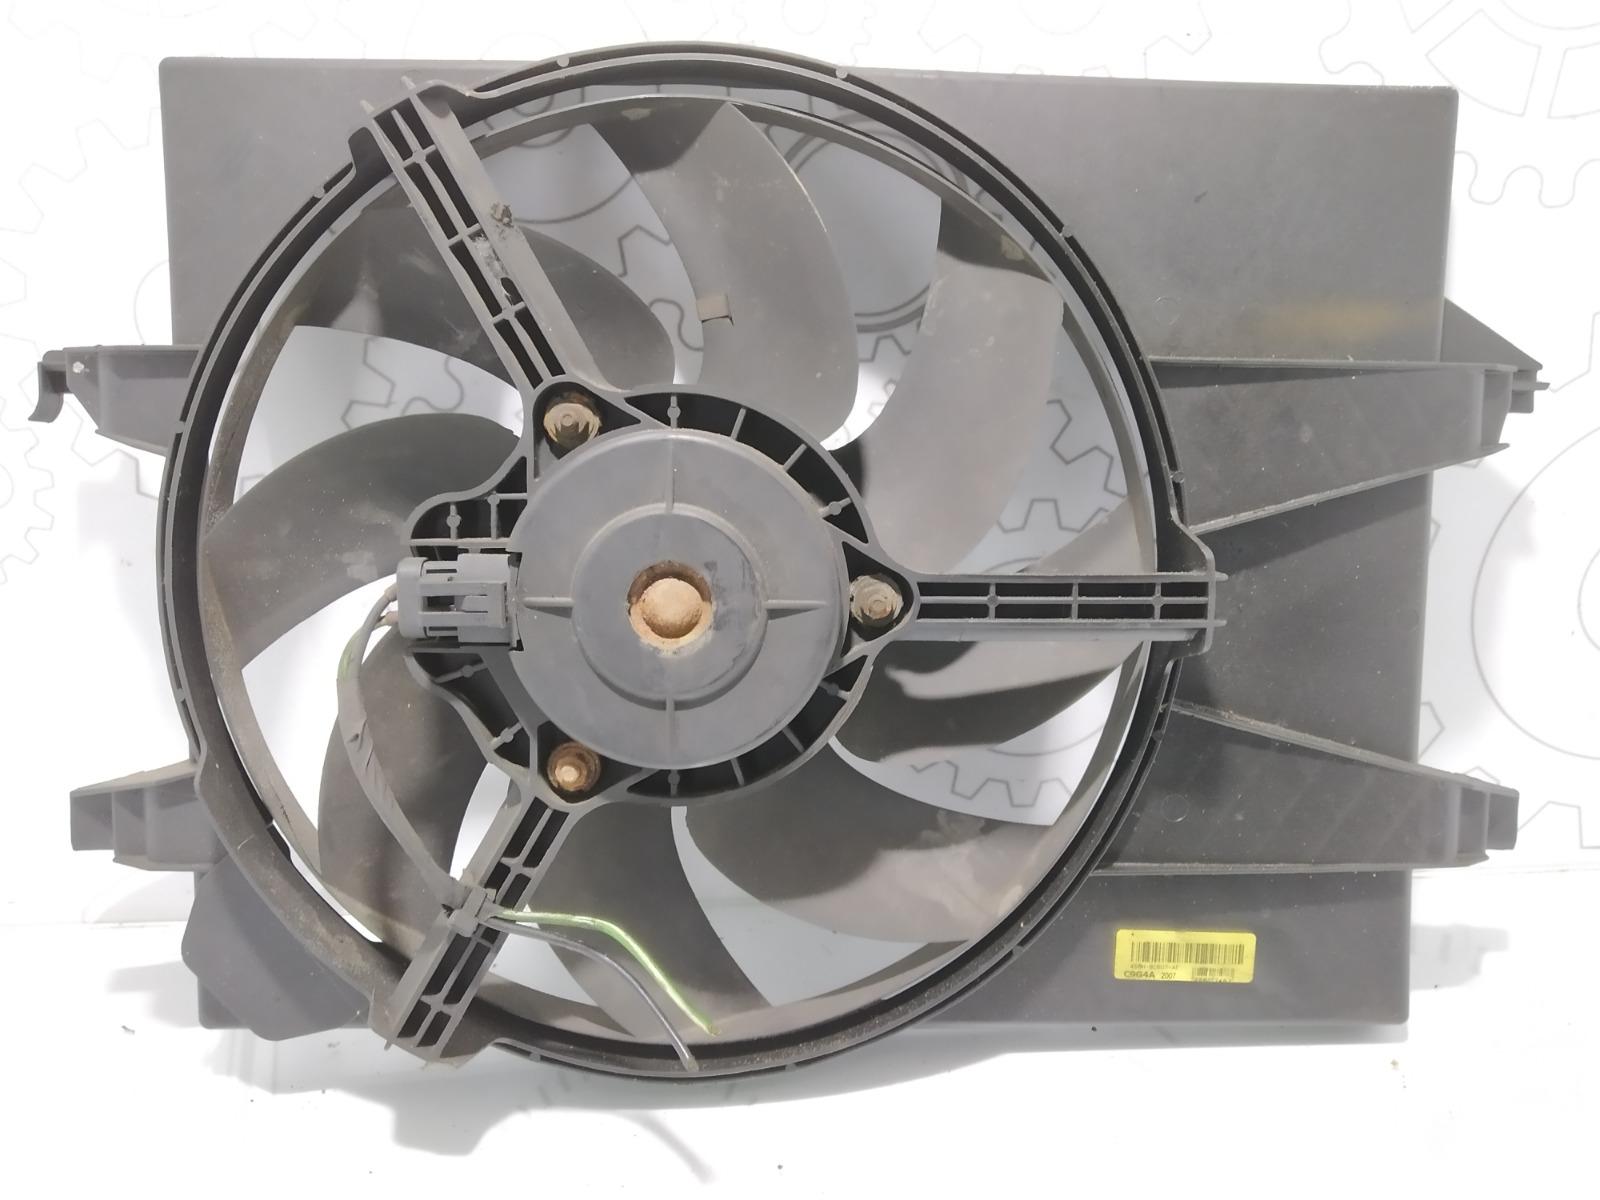 Вентилятор радиатора Ford Fiesta 1.4 TDCI 2007 (б/у)